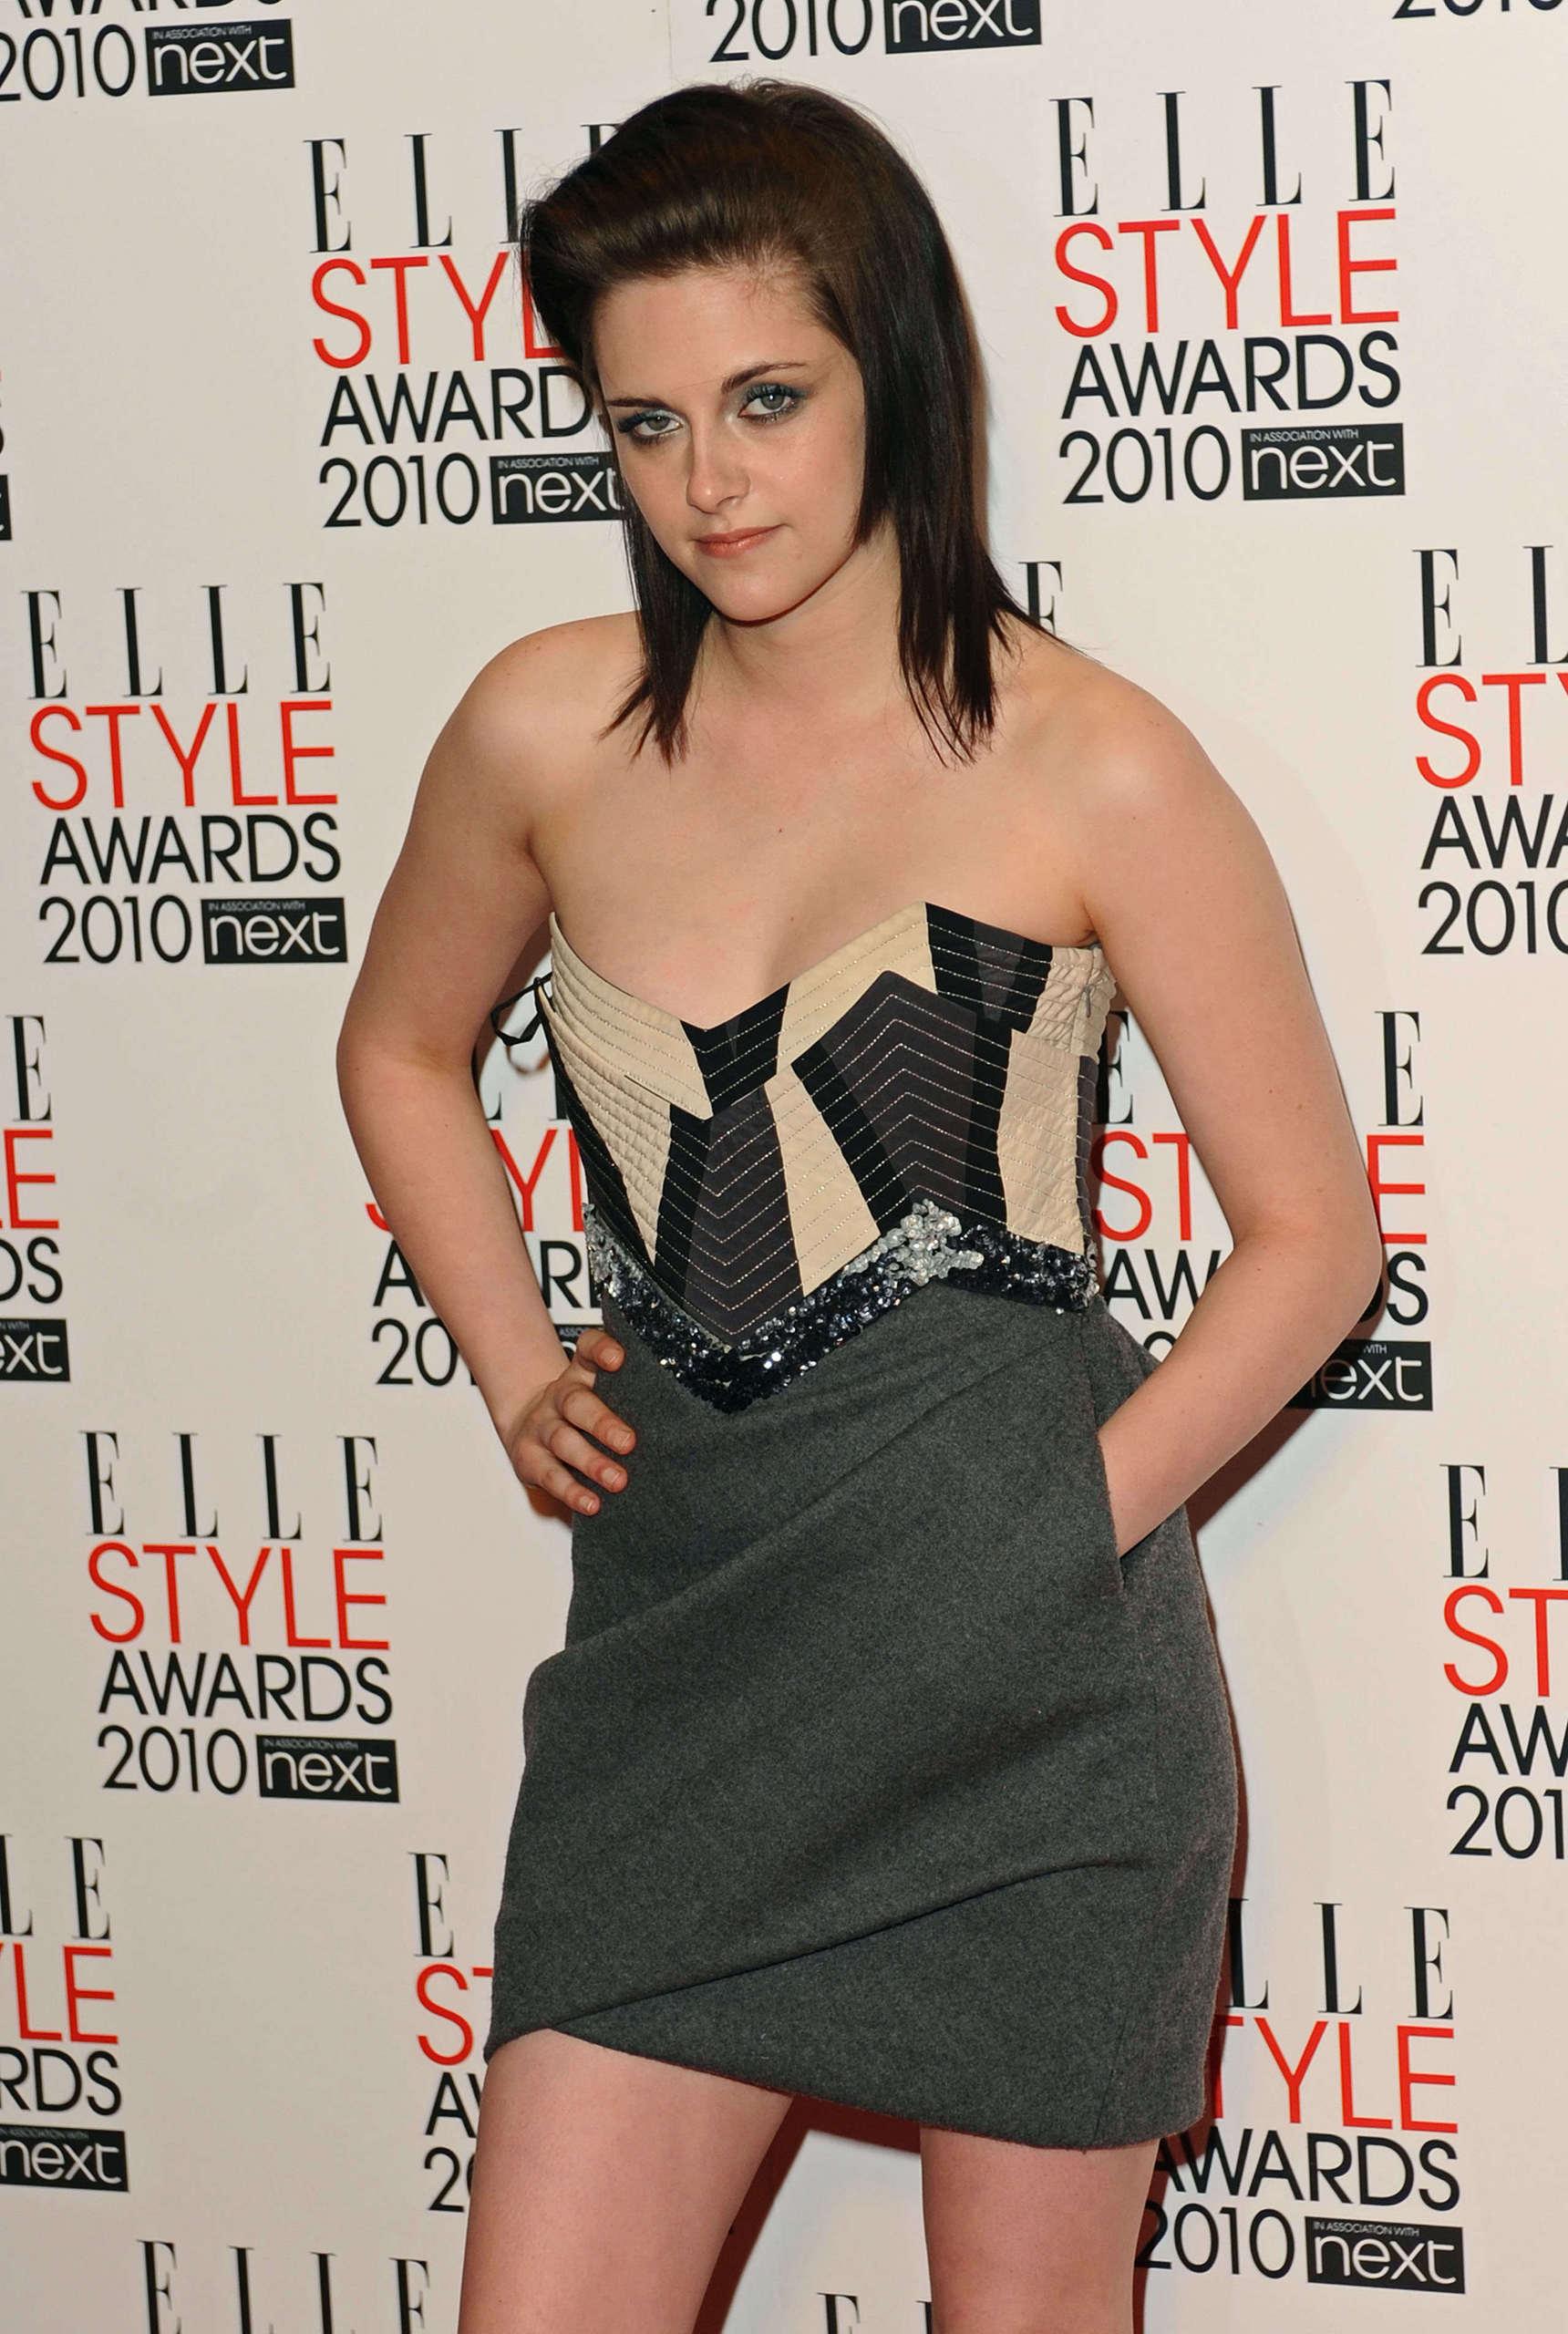 Kristen Stewart on Elle Style Awards